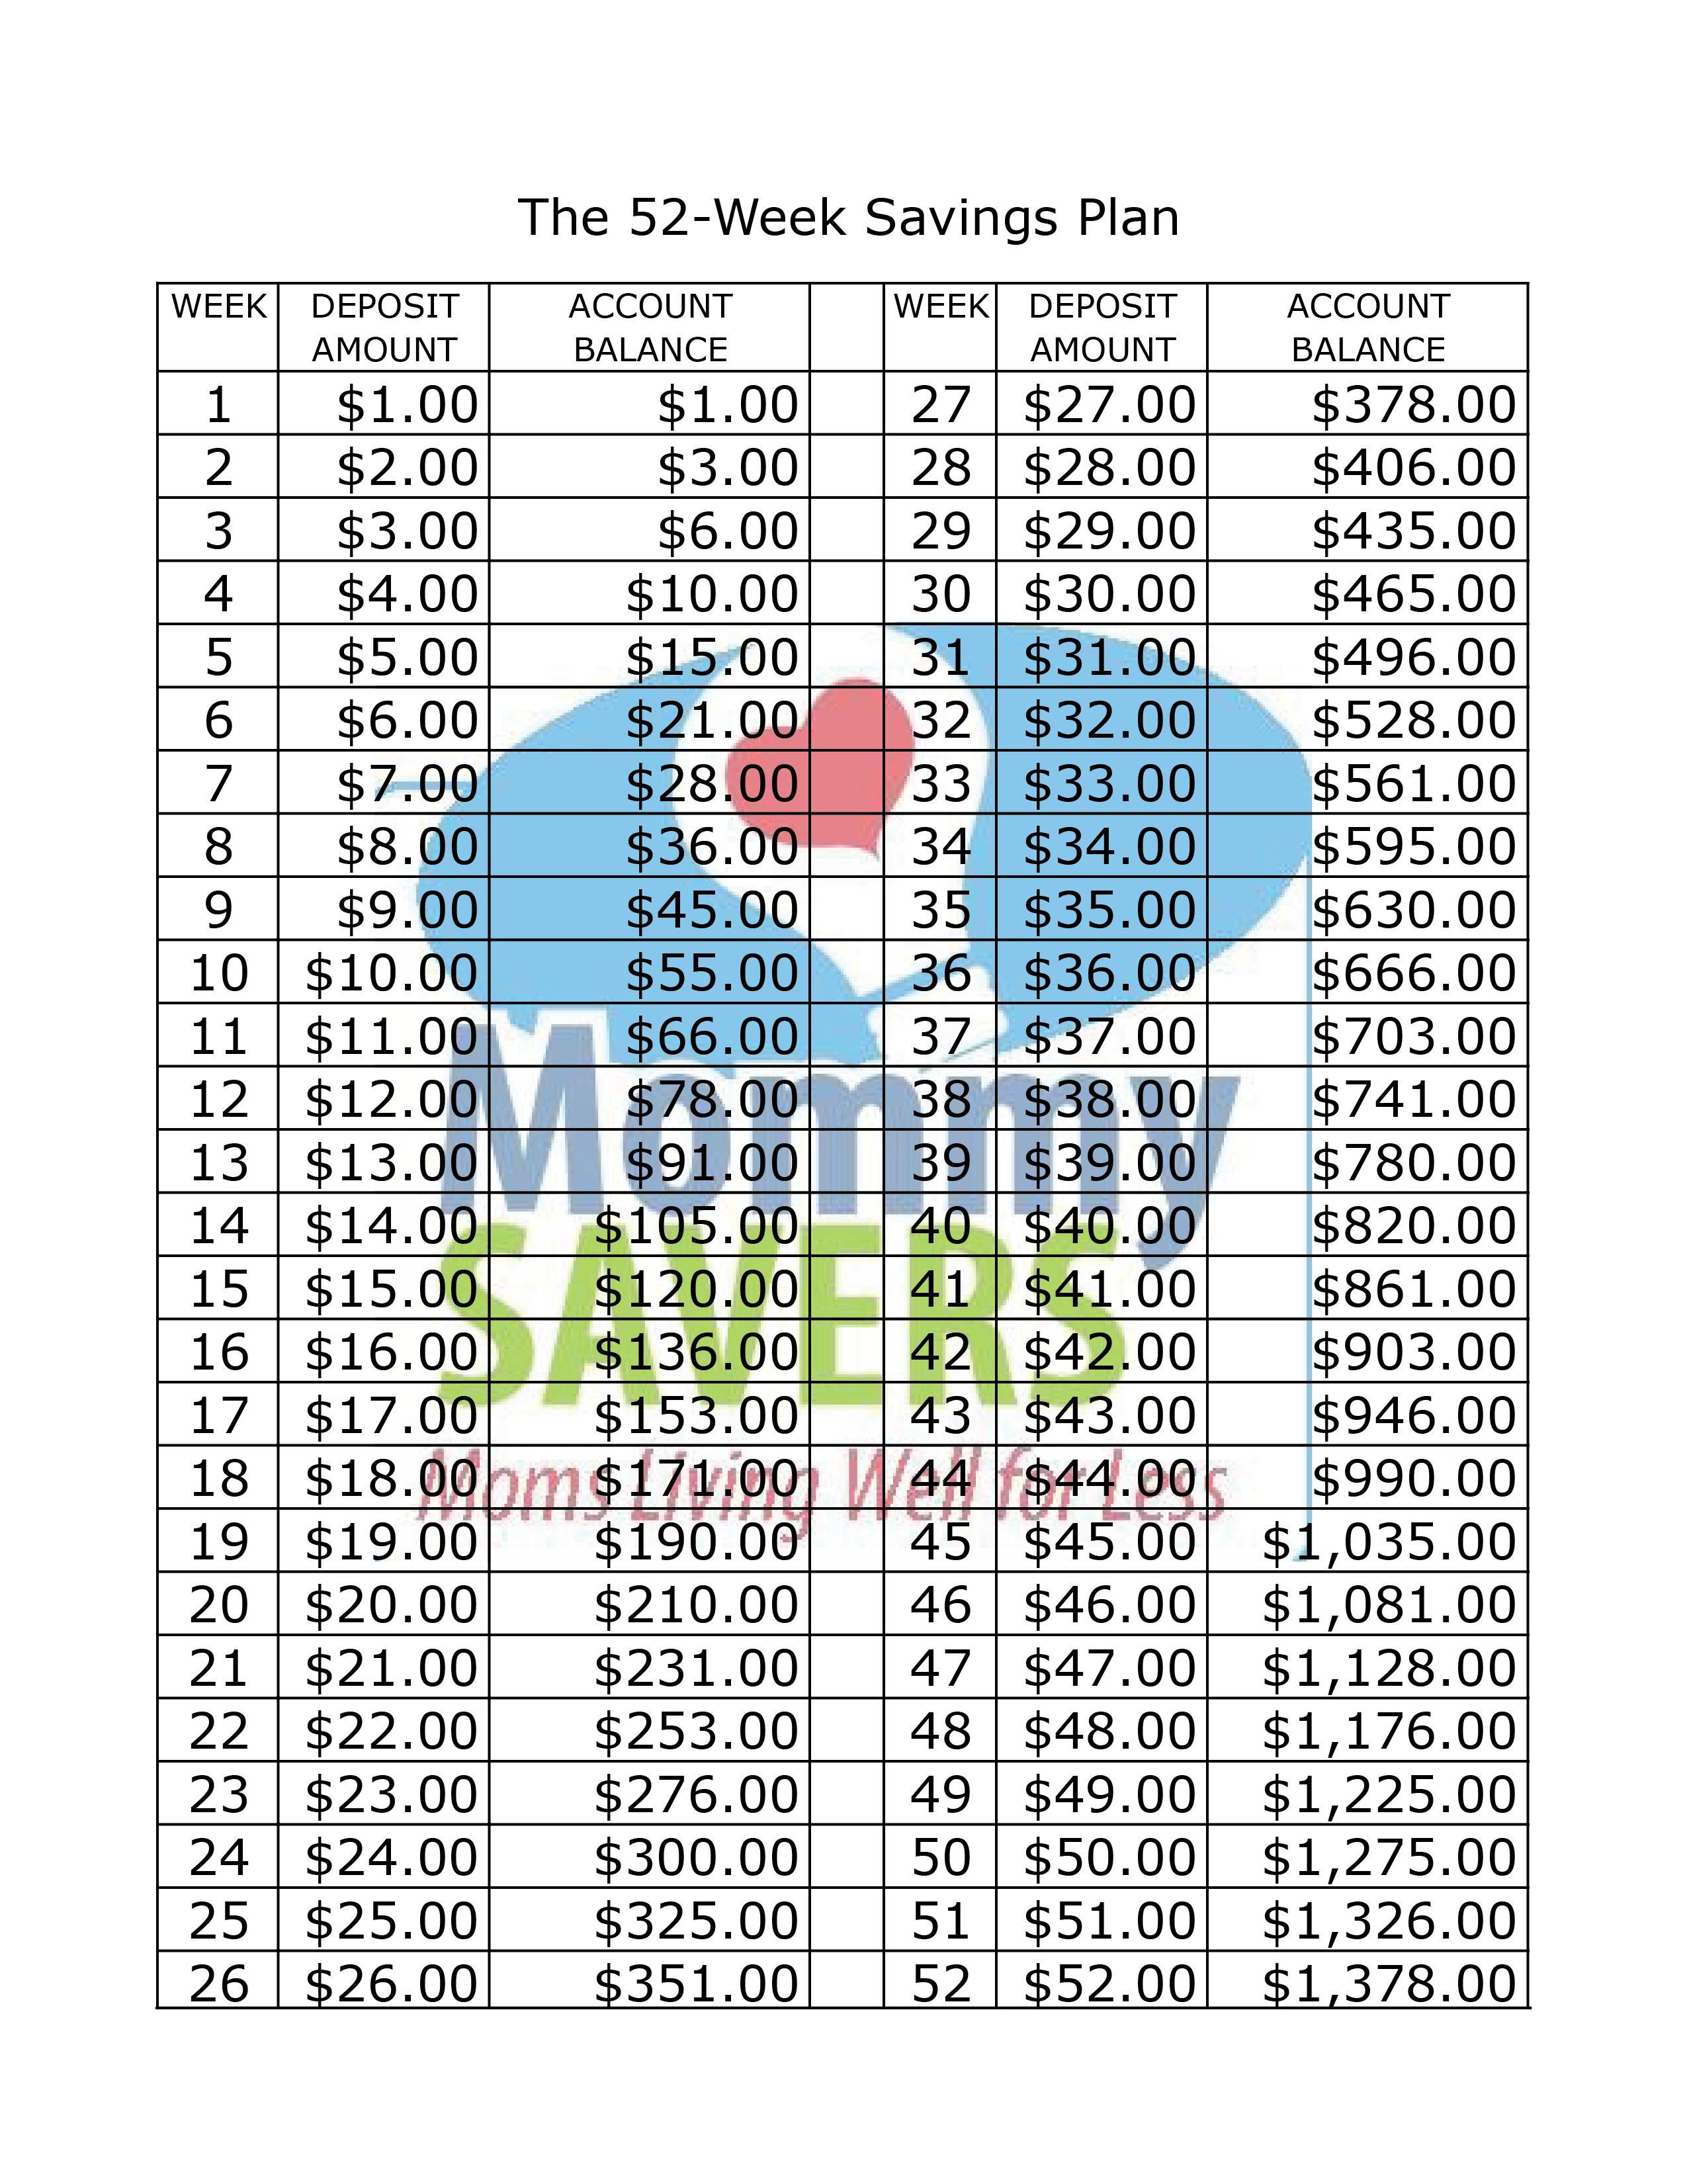 image regarding Printable Money Saving Charts identified as The 52-7 days Price savings Application Printable Chart - Mommysavers